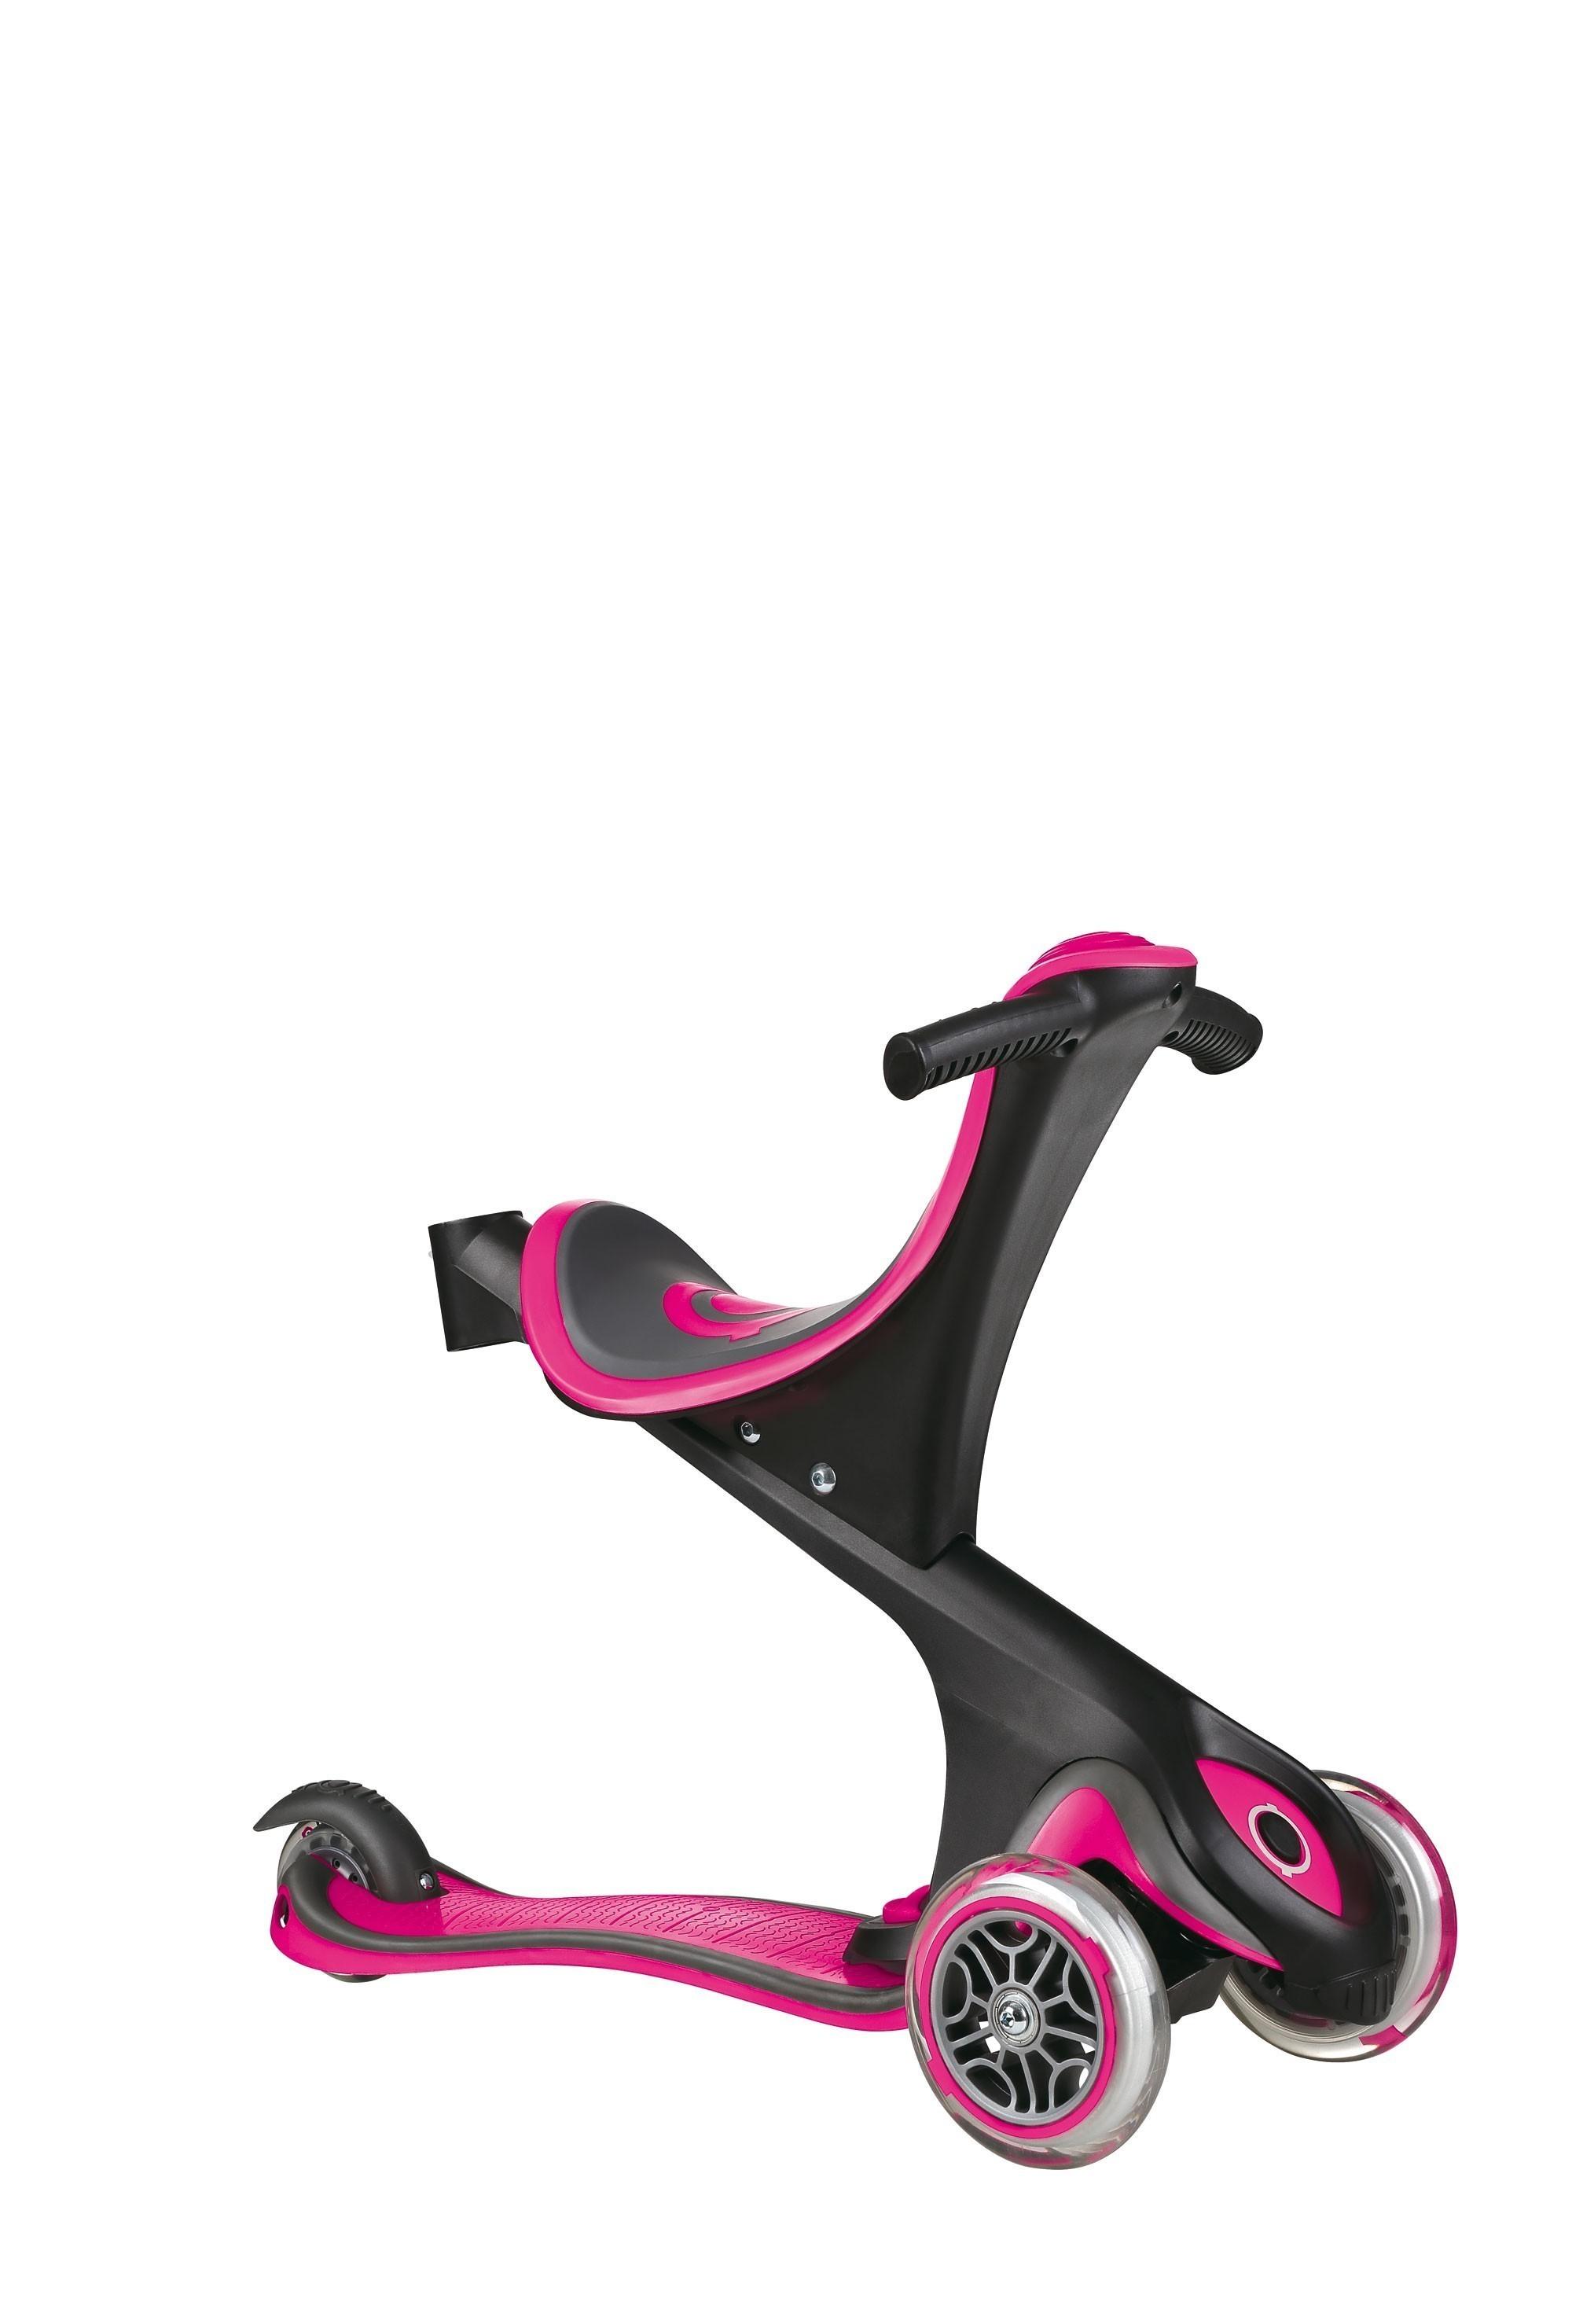 Scooter Kinderroller Dreirad Laufrad Globber Evo Comfort 5in1 pink Bild 4